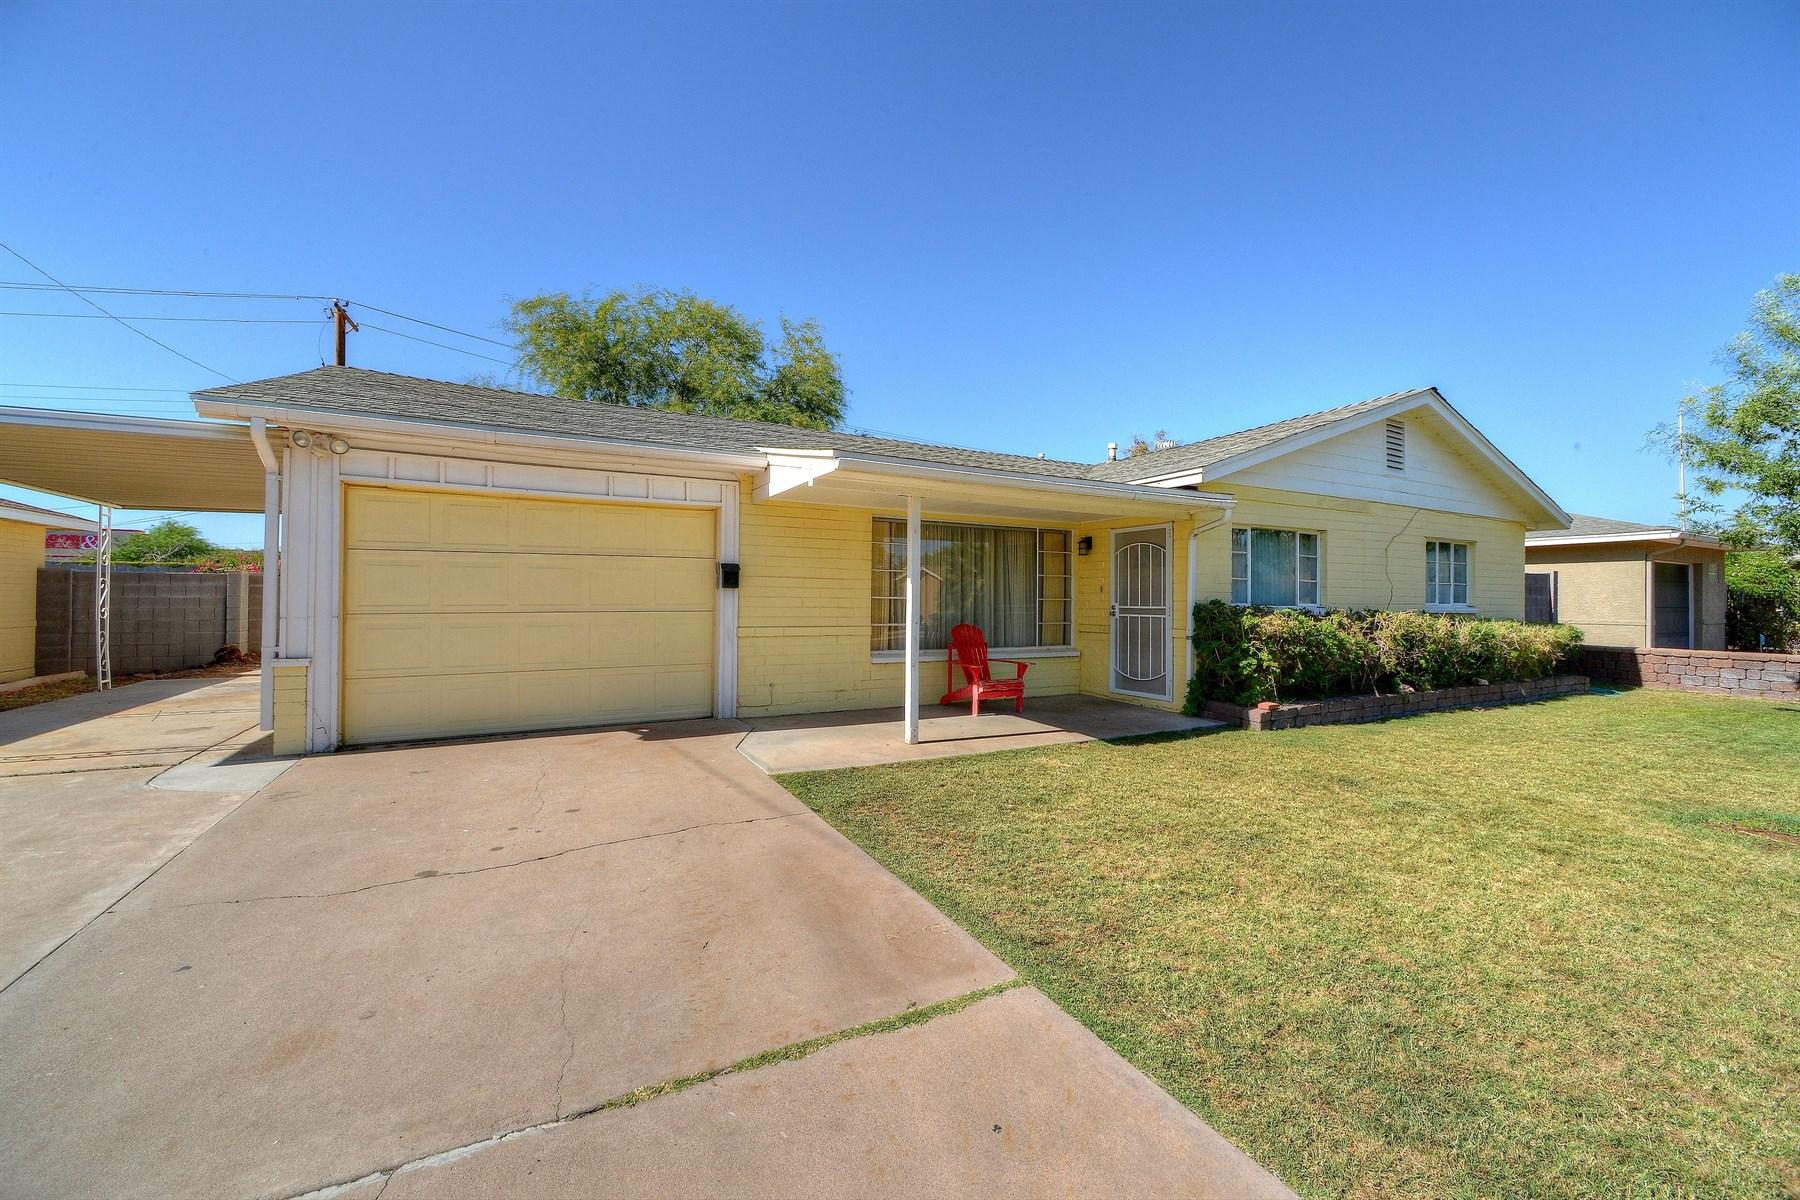 独户住宅 为 销售 在 Lovely home in Highland Estates 1838 E Coolidge St 菲尼克斯(凤凰城), 亚利桑那州, 85016 美国